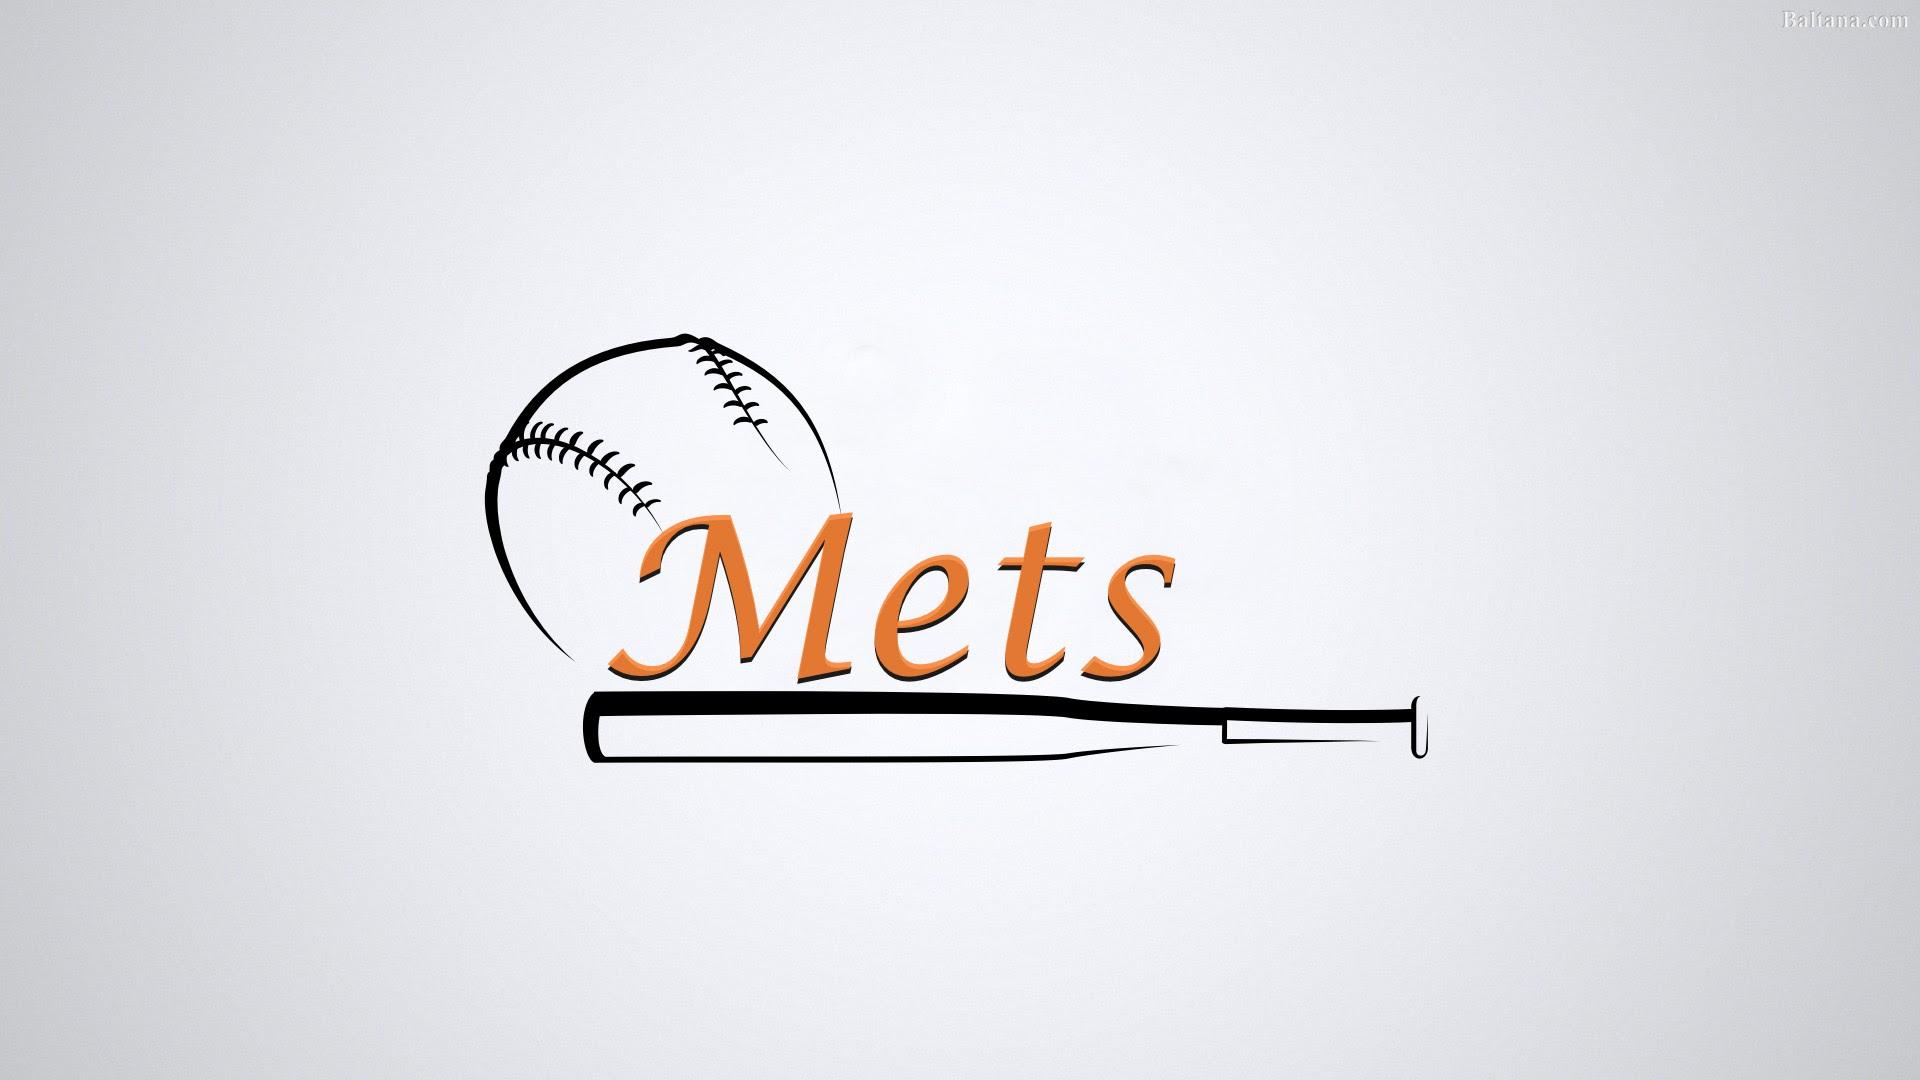 New York Mets Wallpaper 33219 Baltana